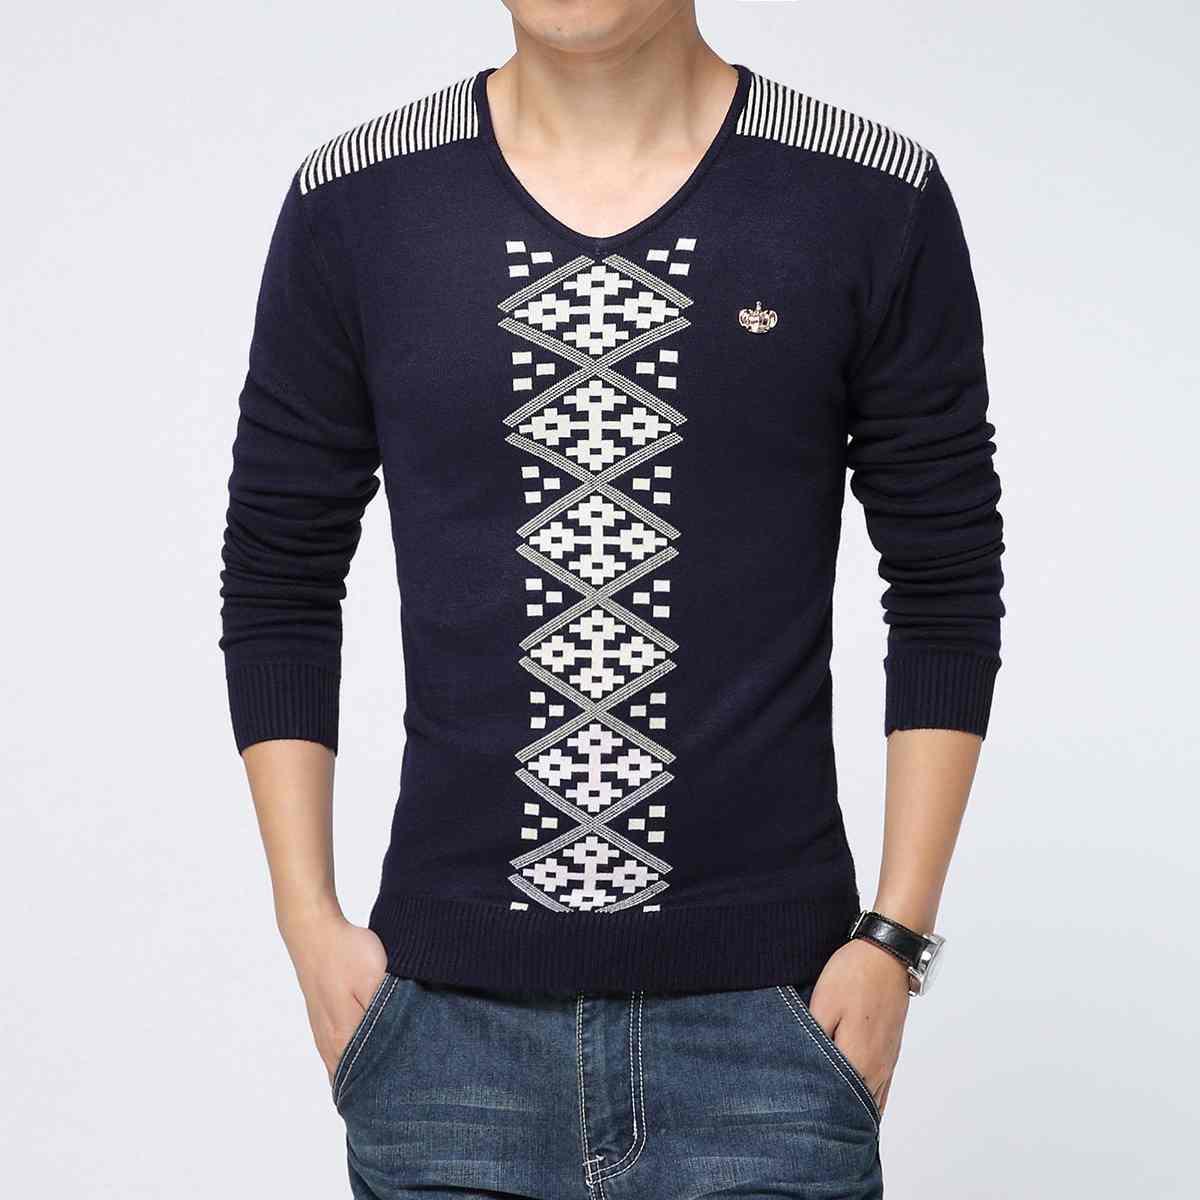 New mens cotton sweater crewneck Jacquard men menswear(China (Mainland))